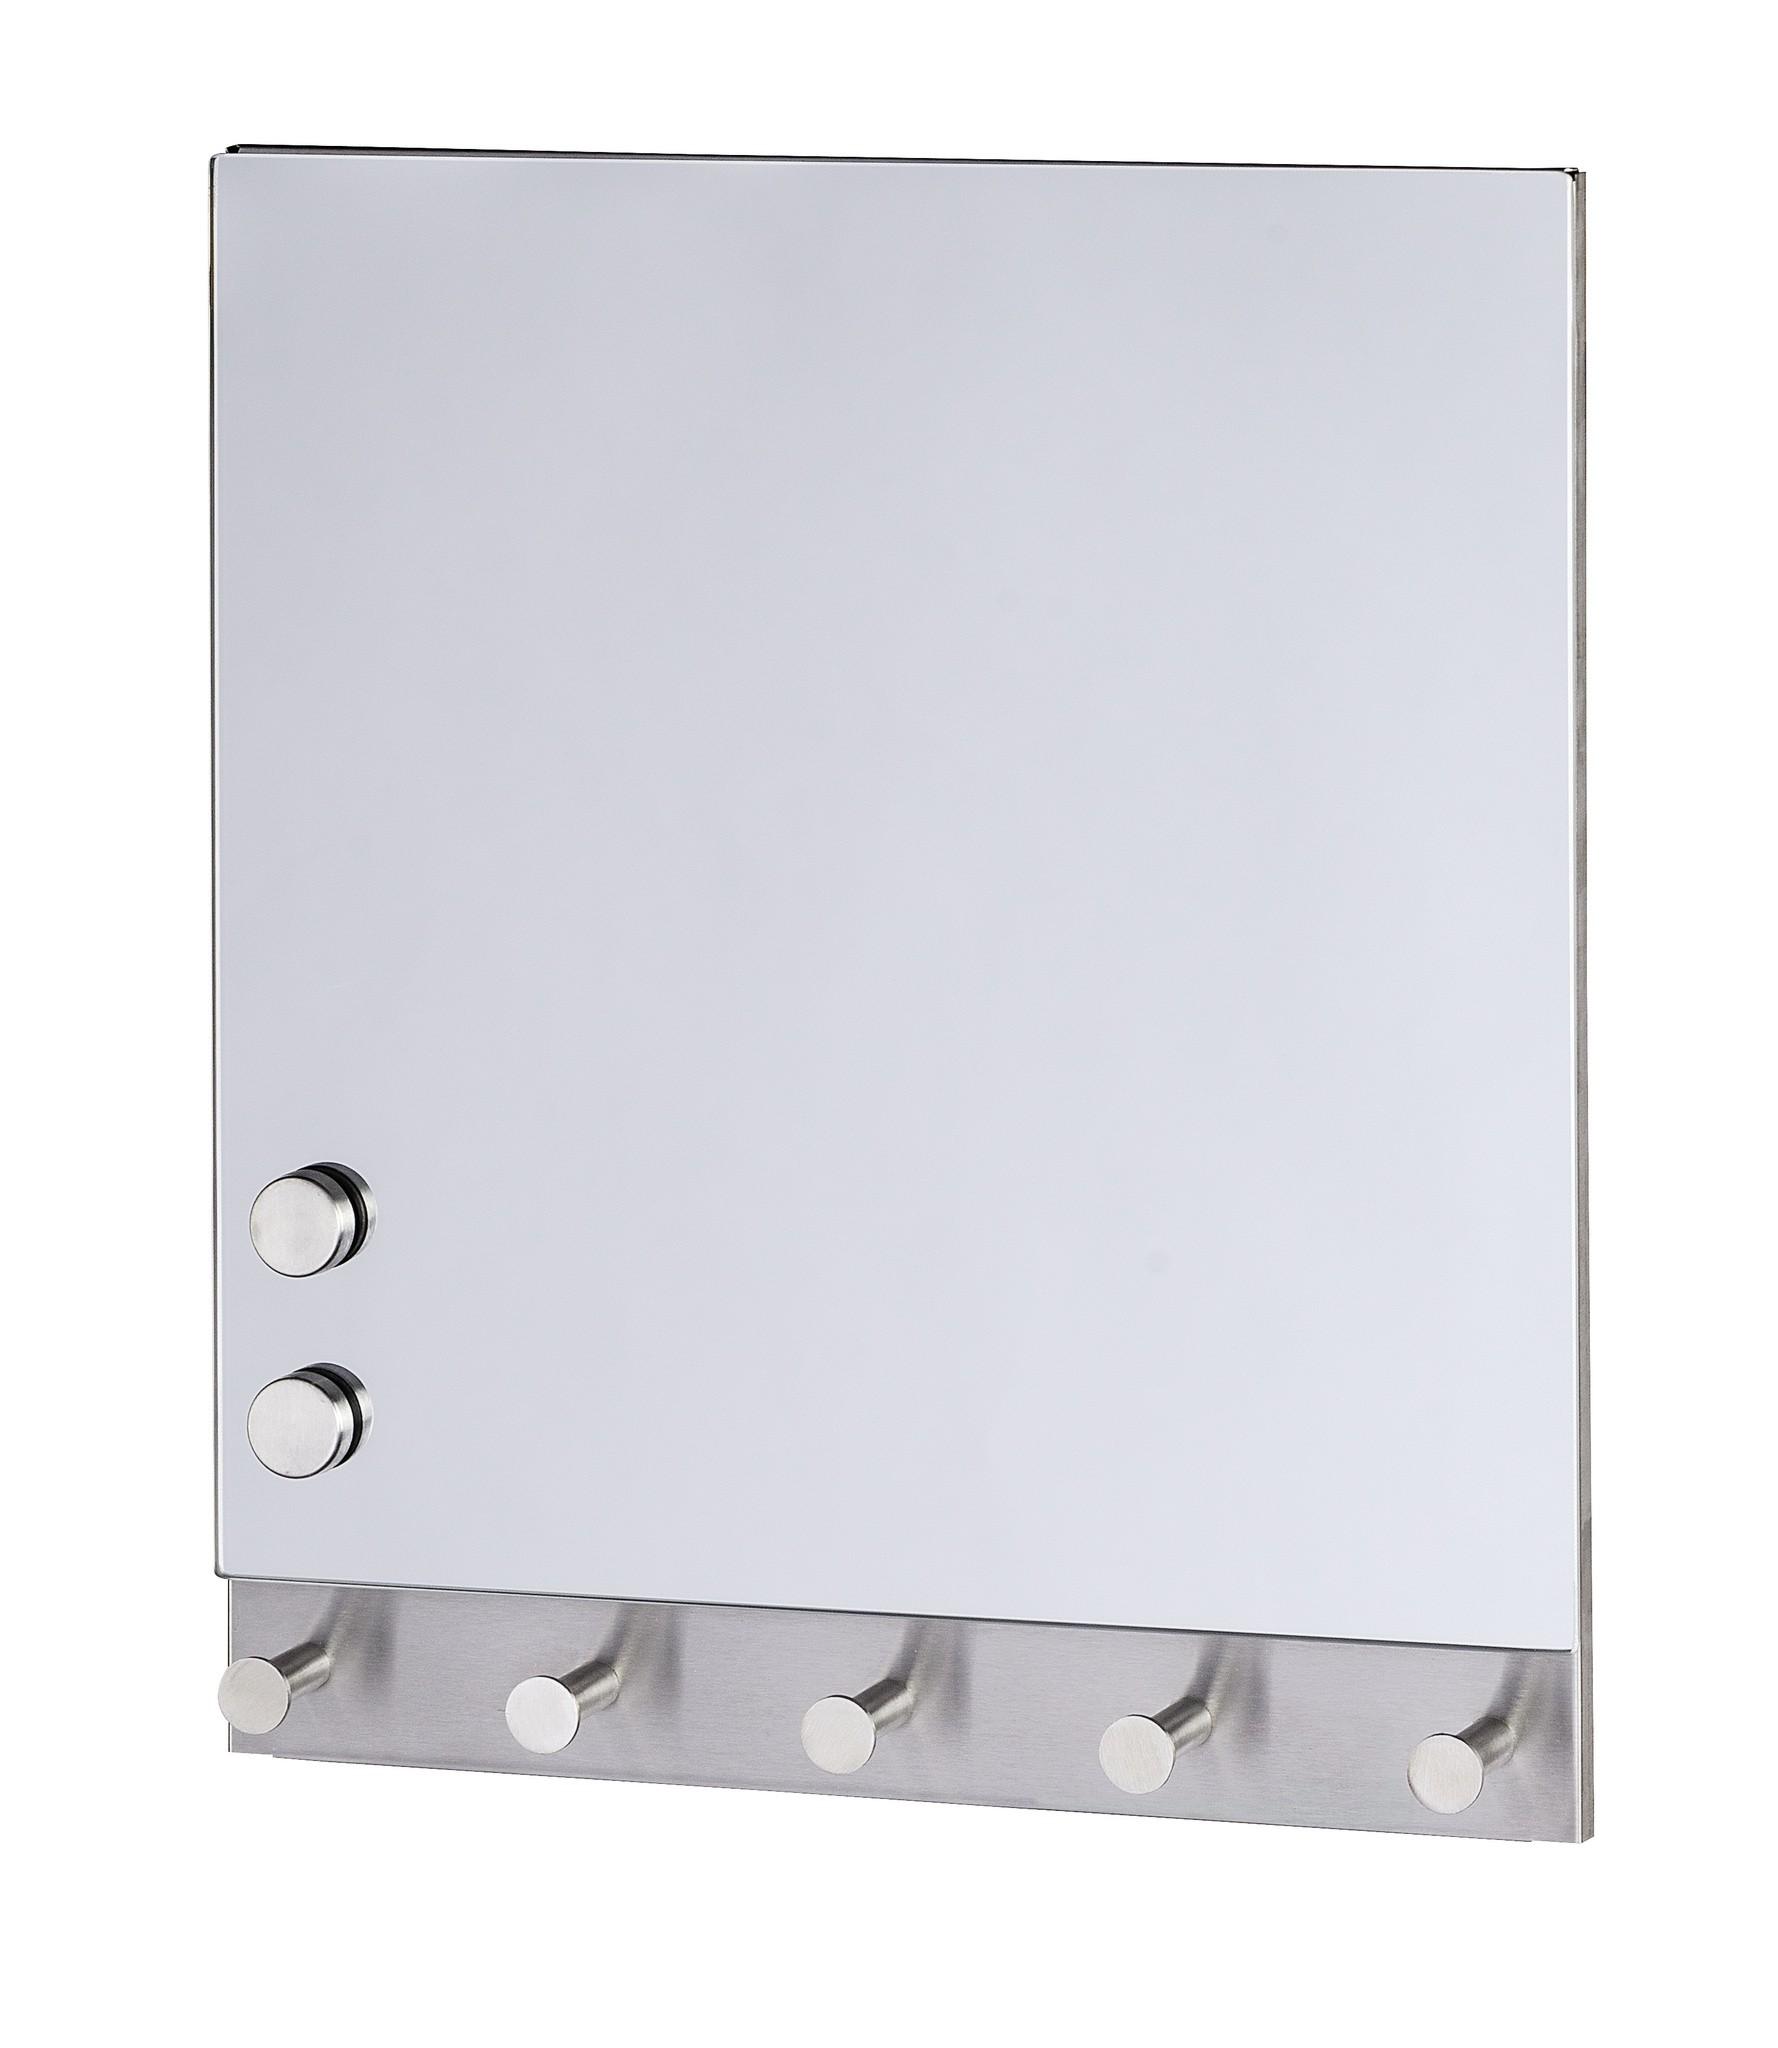 Magnetische Garderobe Mirror, 5 Haken, 30 x 34 cm